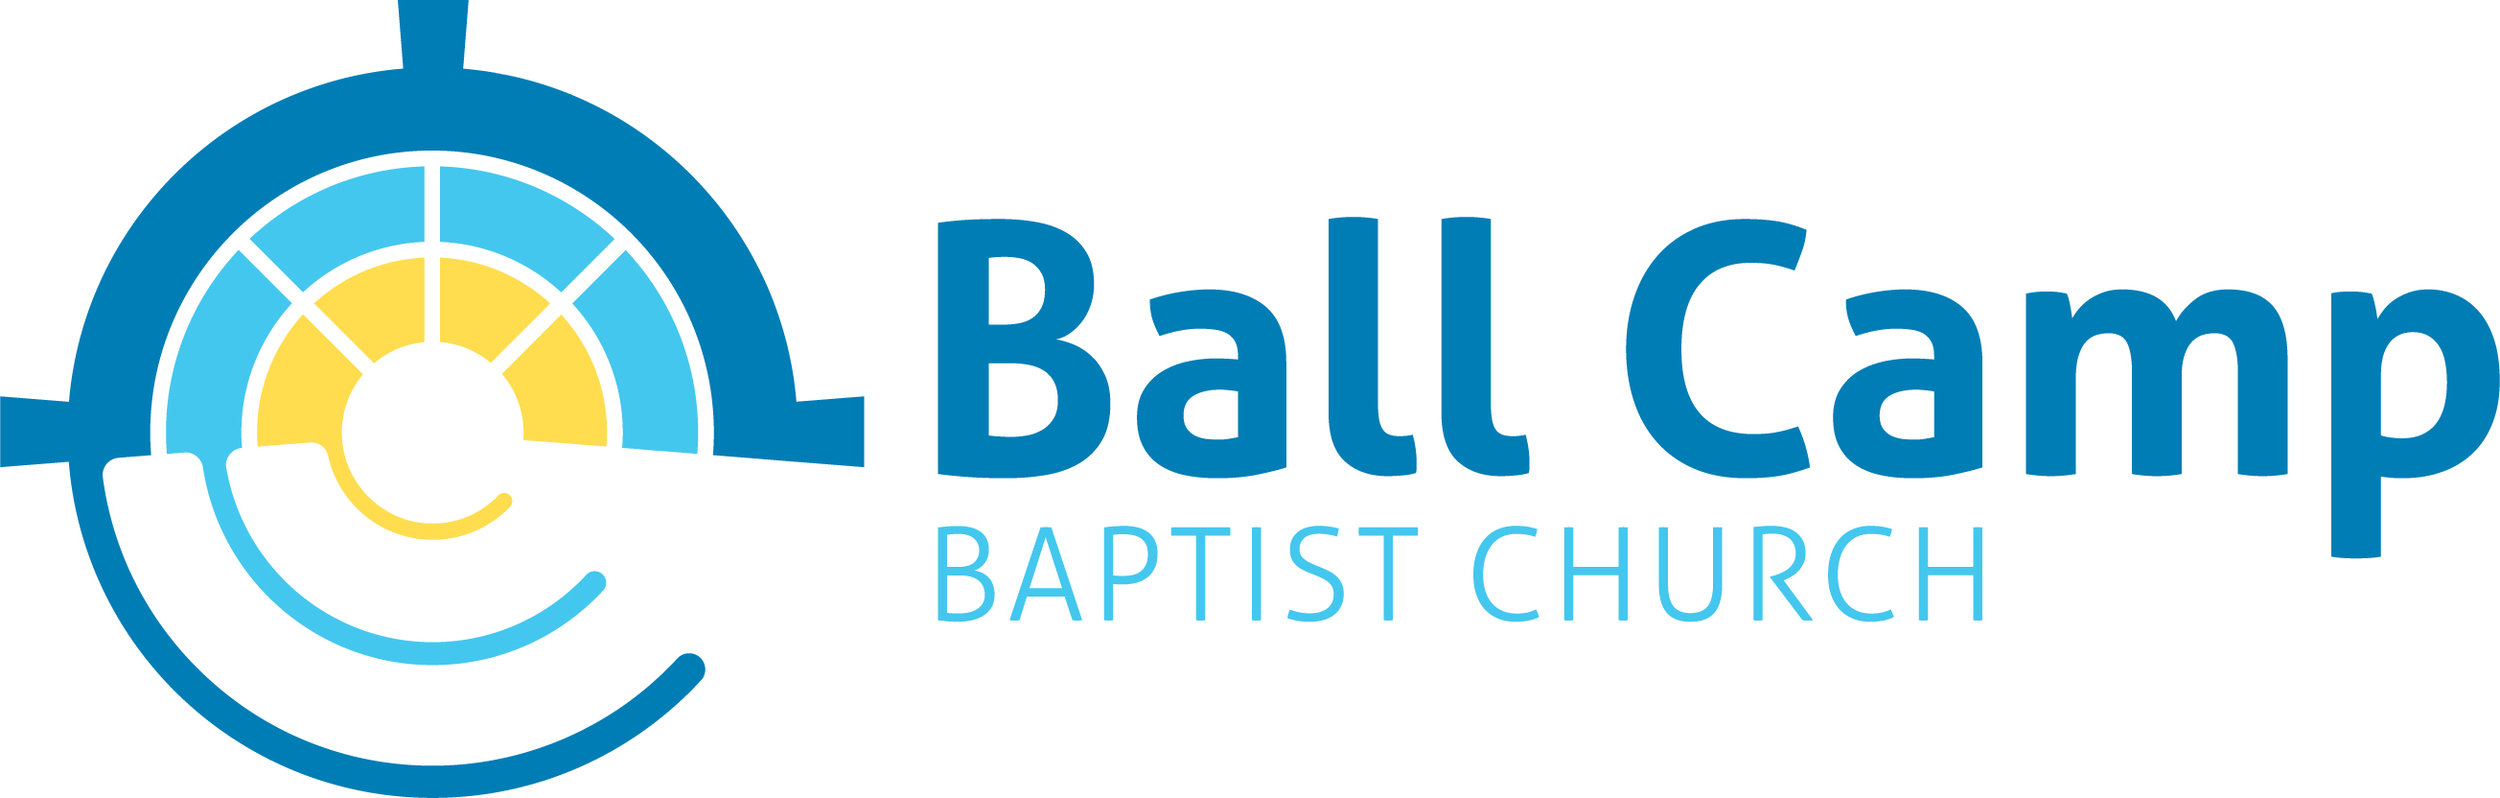 BallCamp_logo.jpg